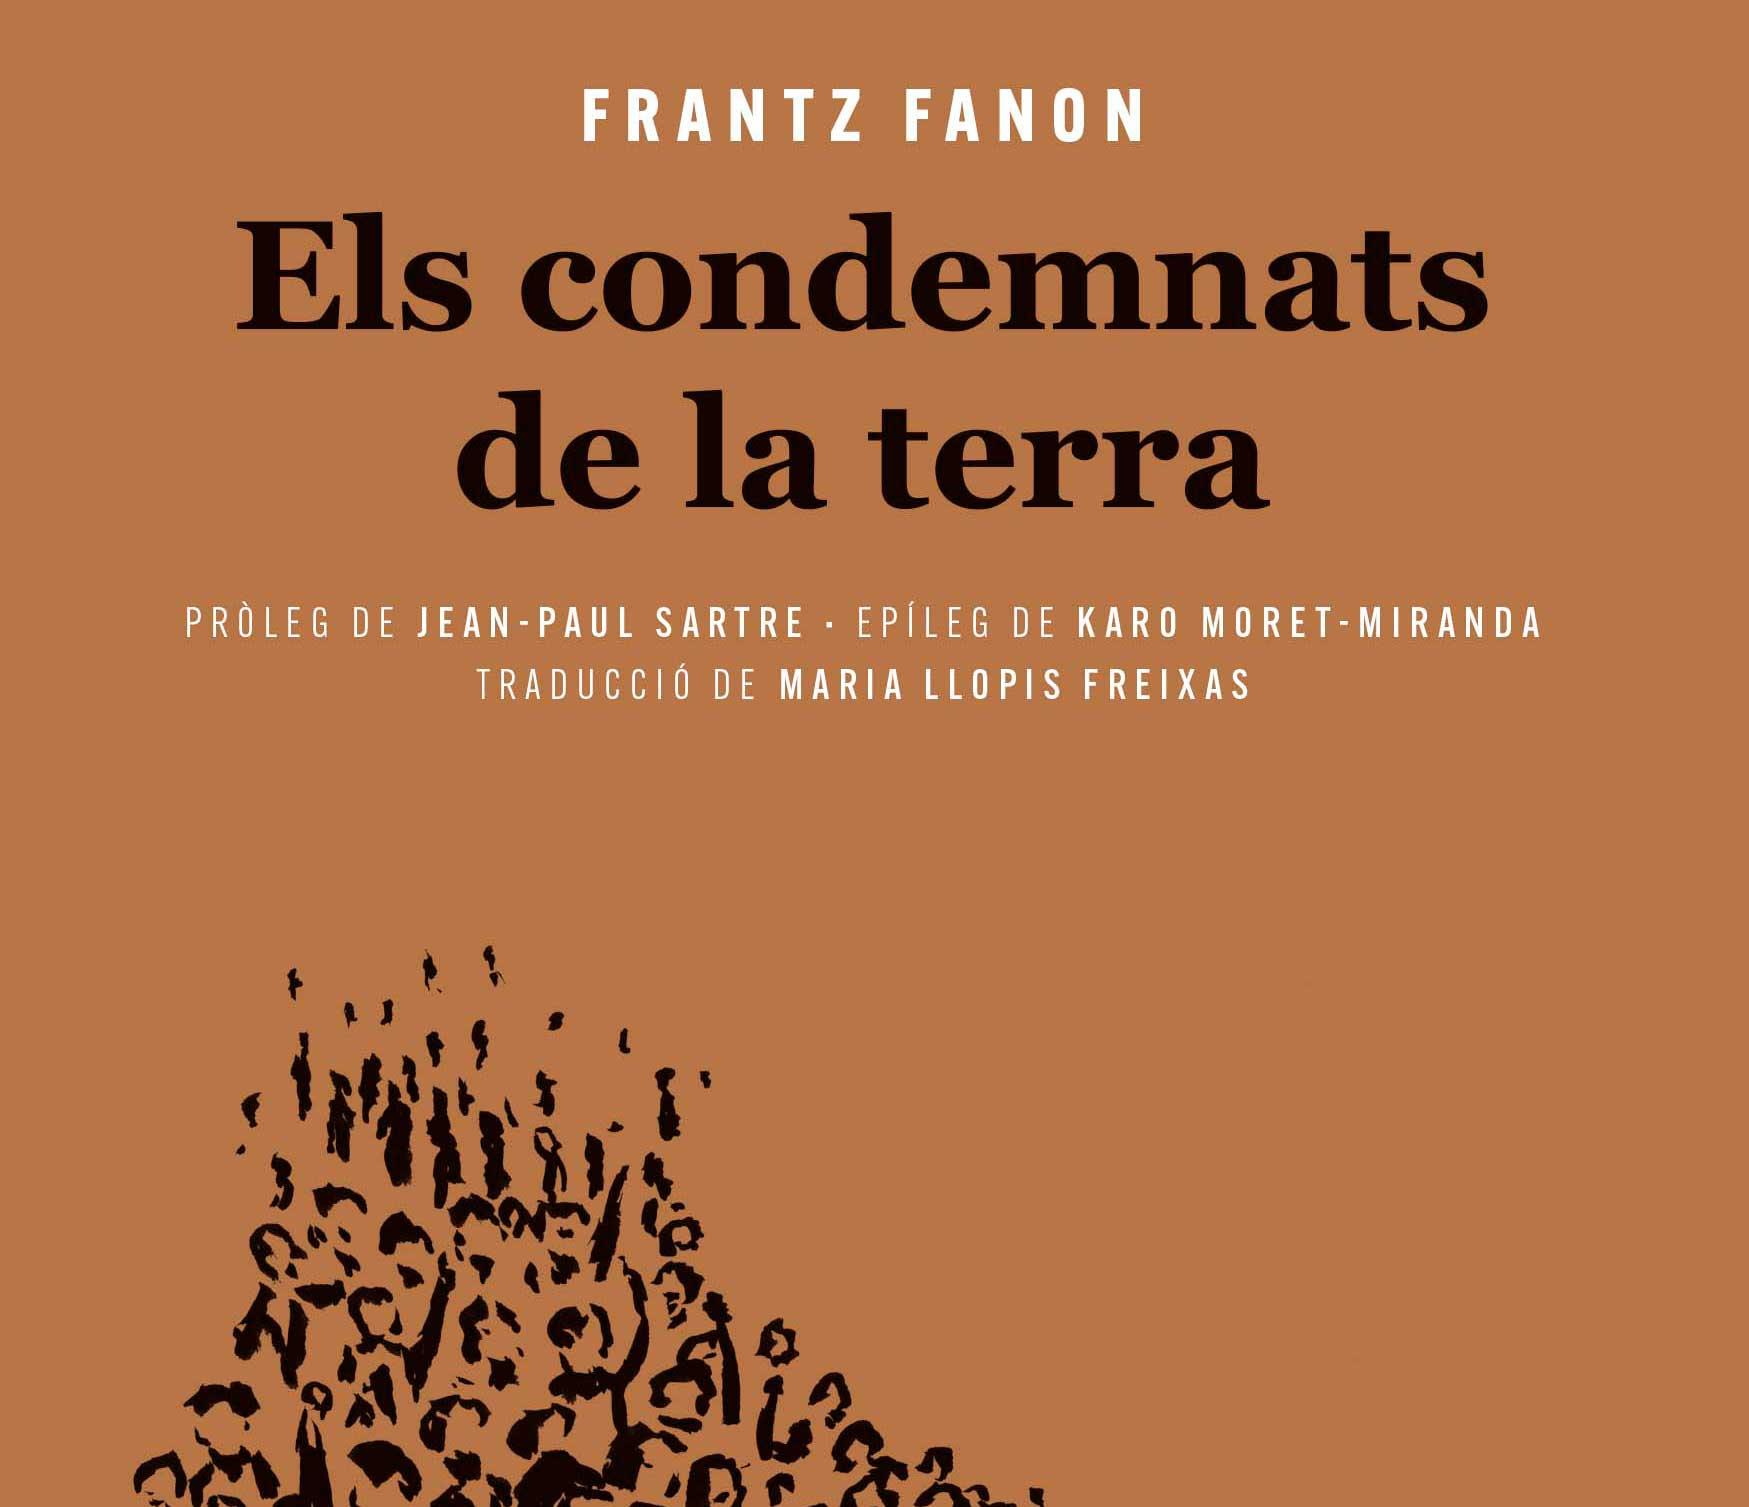 fanon-1.jpg